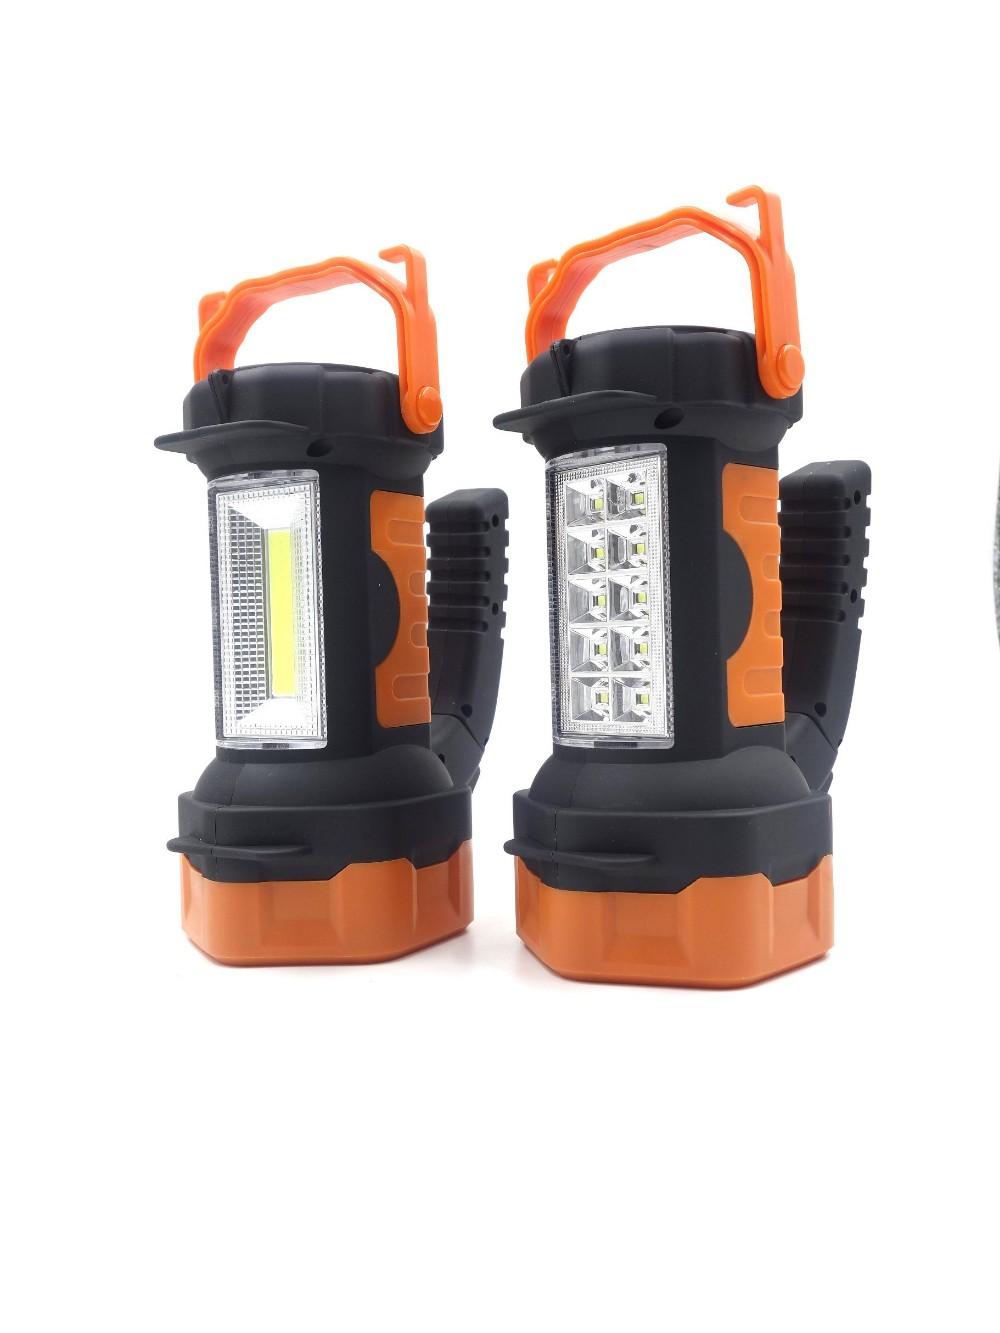 Waterproof Spotlight COB/SMD 250 Lumen Flashlight Torch Hand-held Searchlights Portable Search Light Concentrating Work Lights